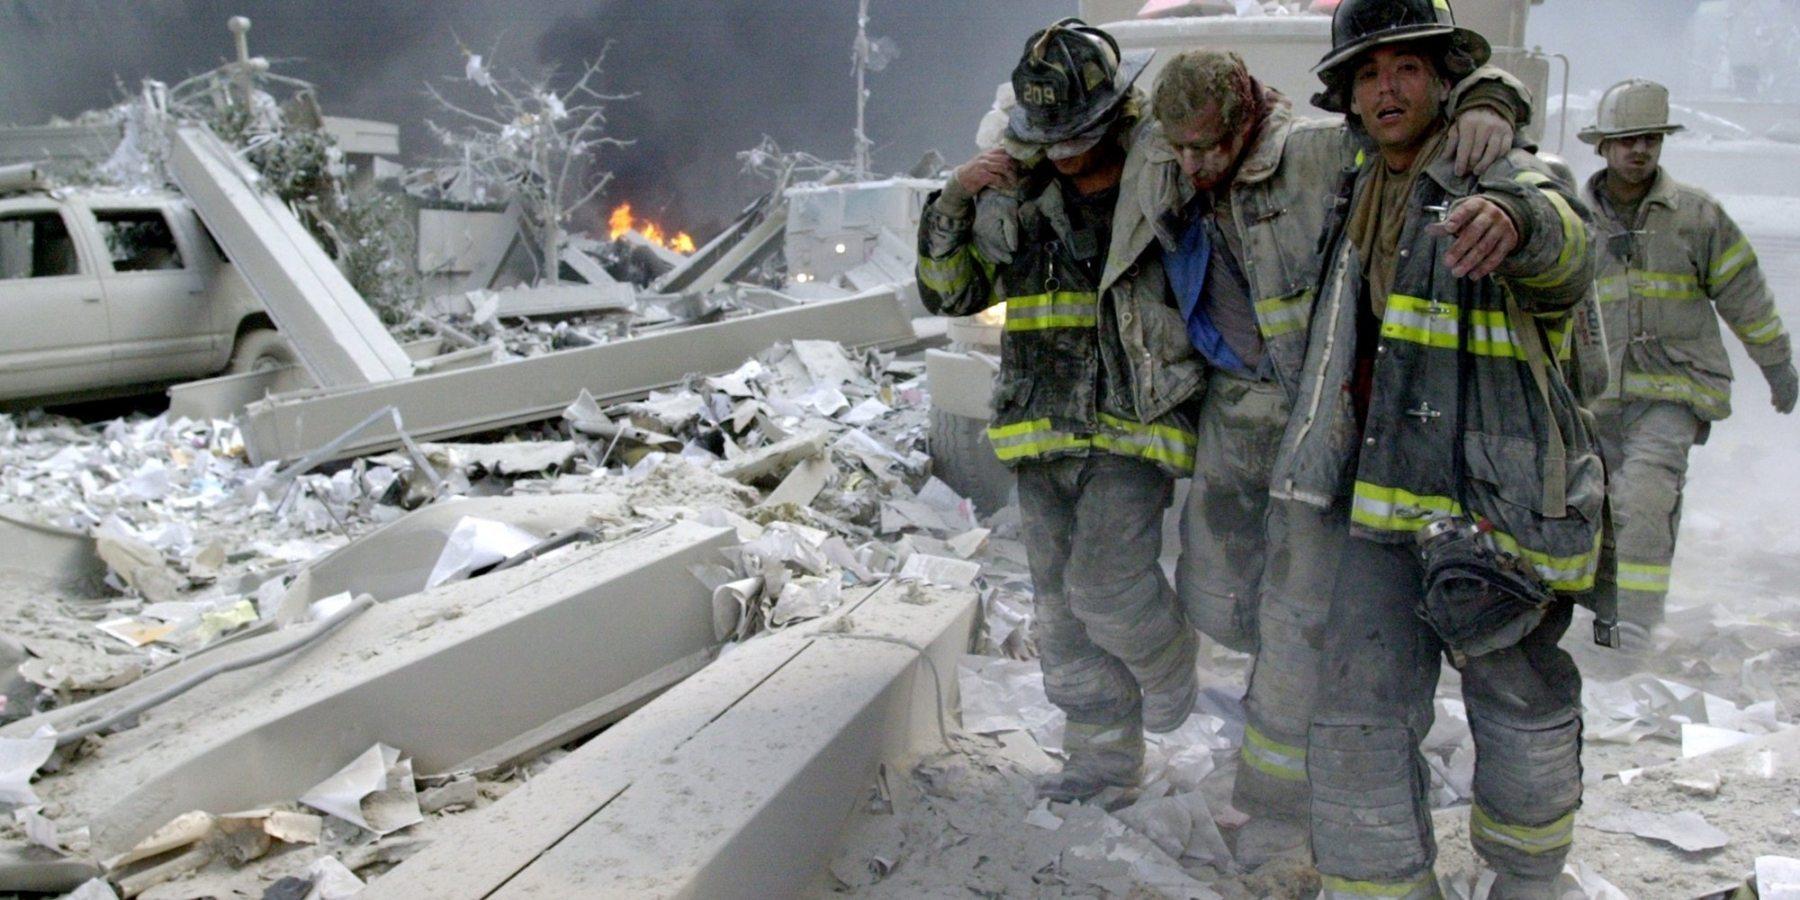 Image 9/11 FDNY